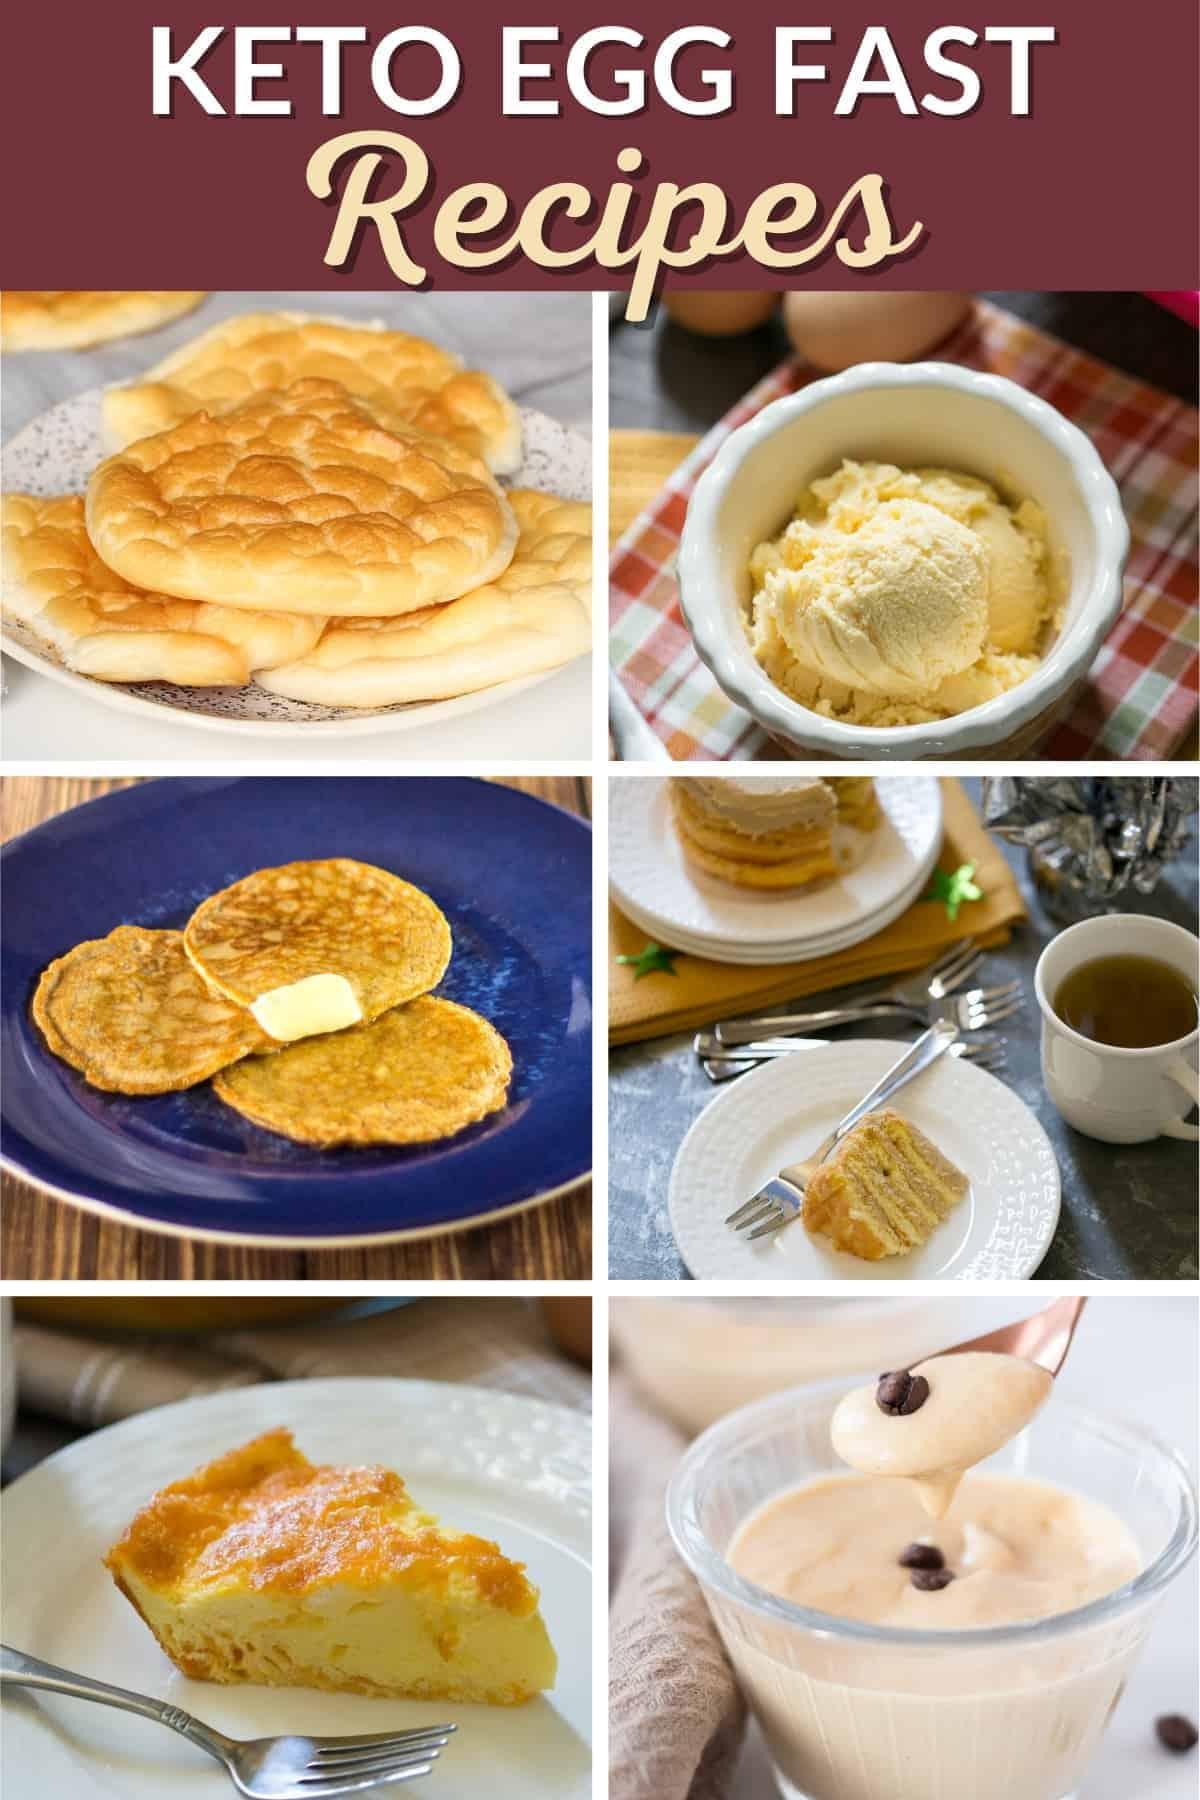 keto egg fast recipes pinterest image